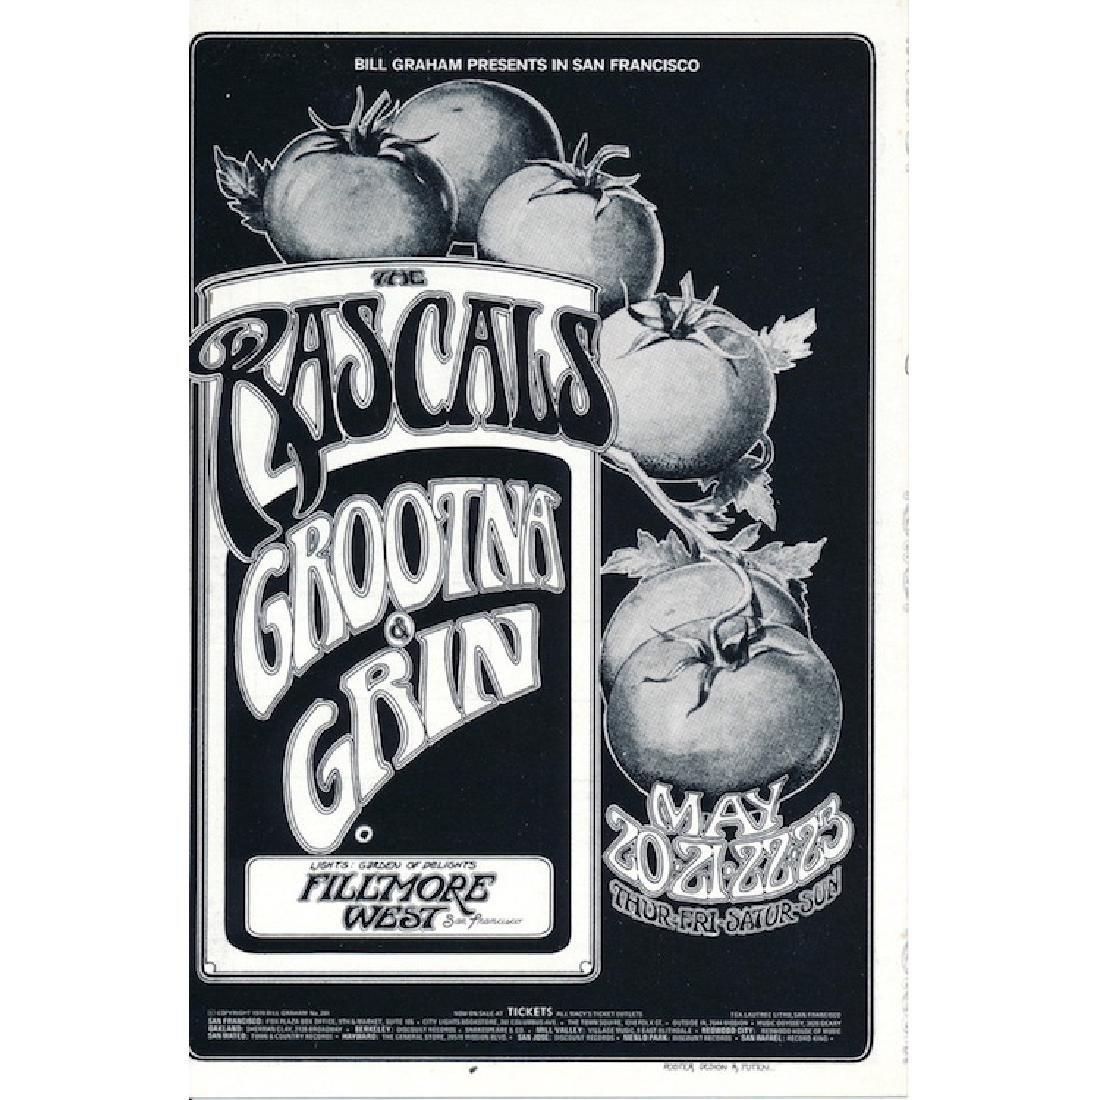 The Rascals - 1971 Fillmore Concert Handbill